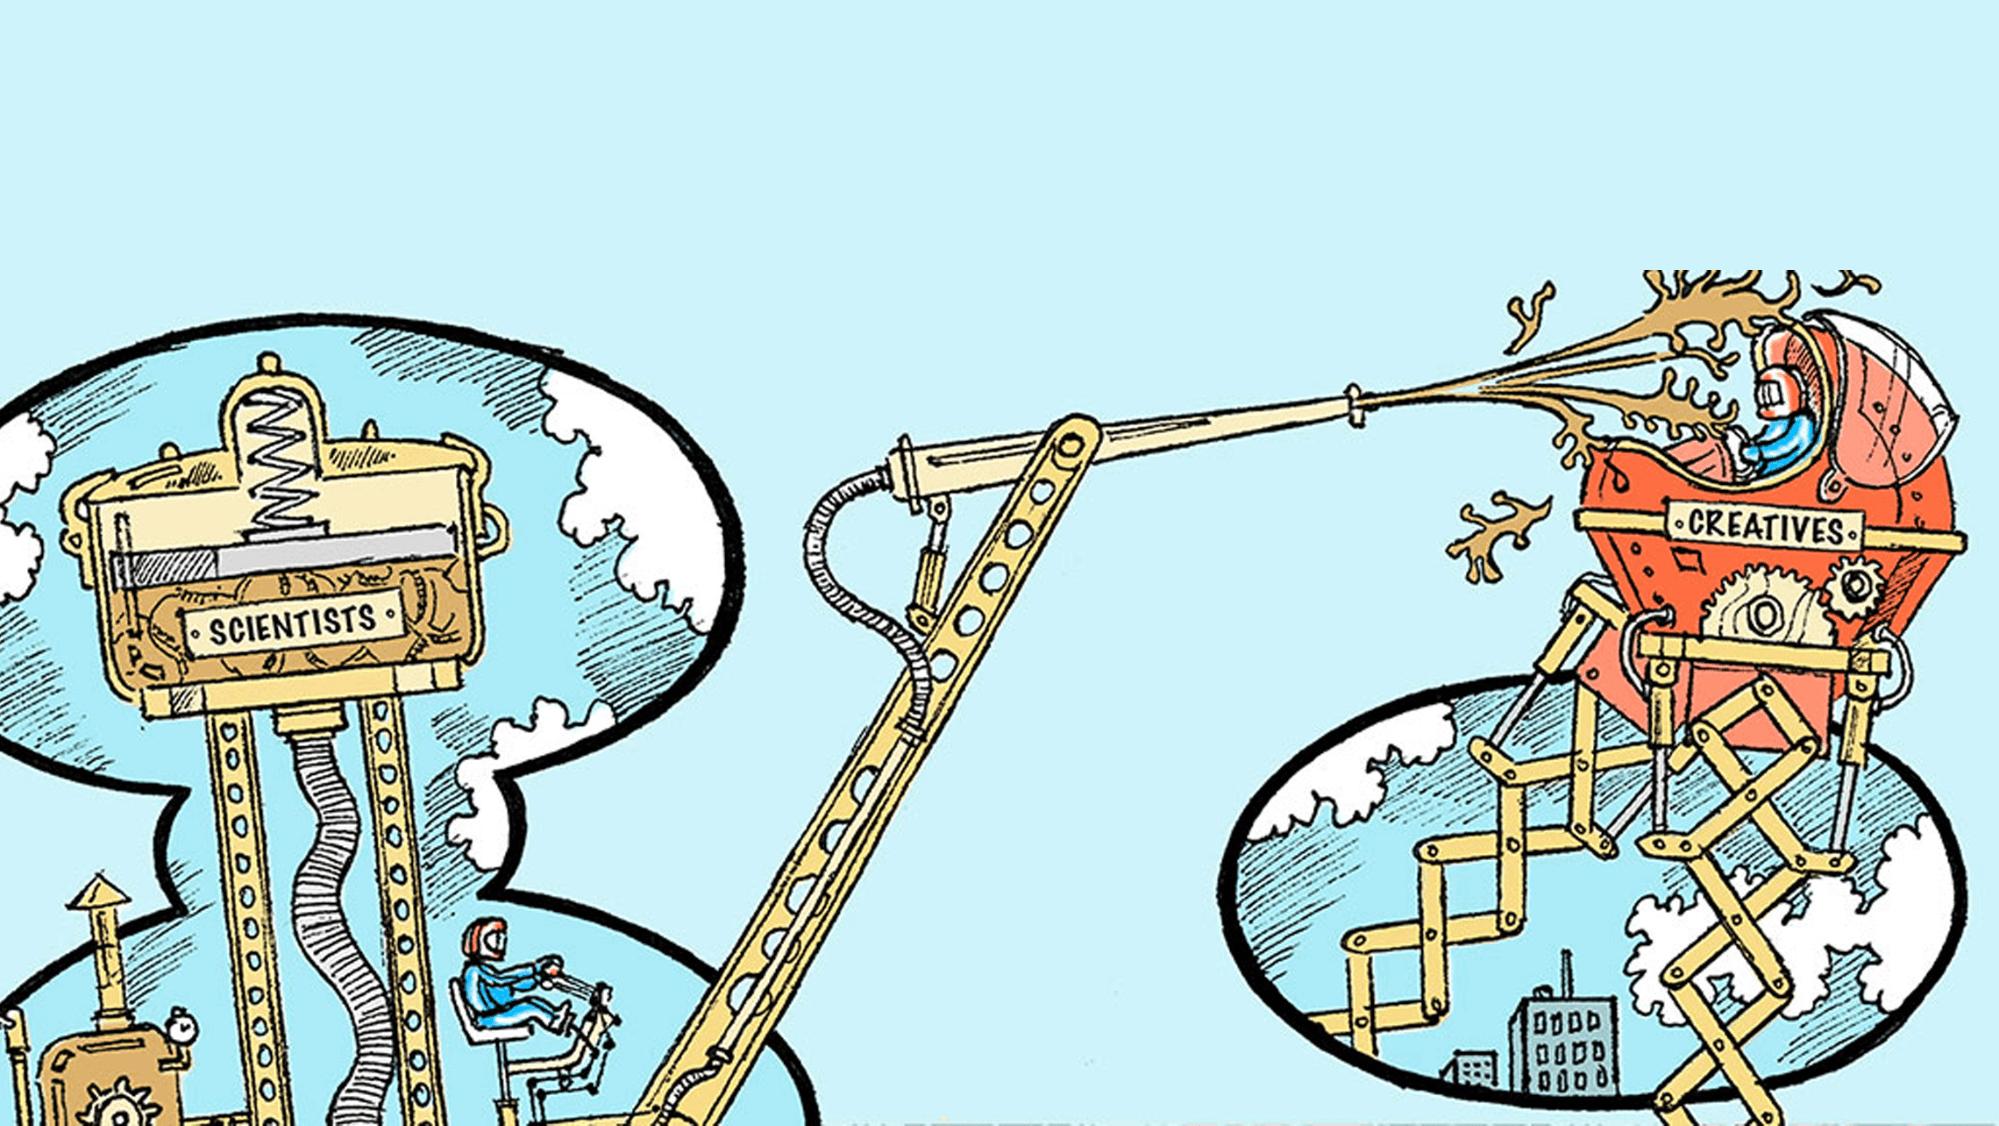 Science vs Creativity for App Ideas